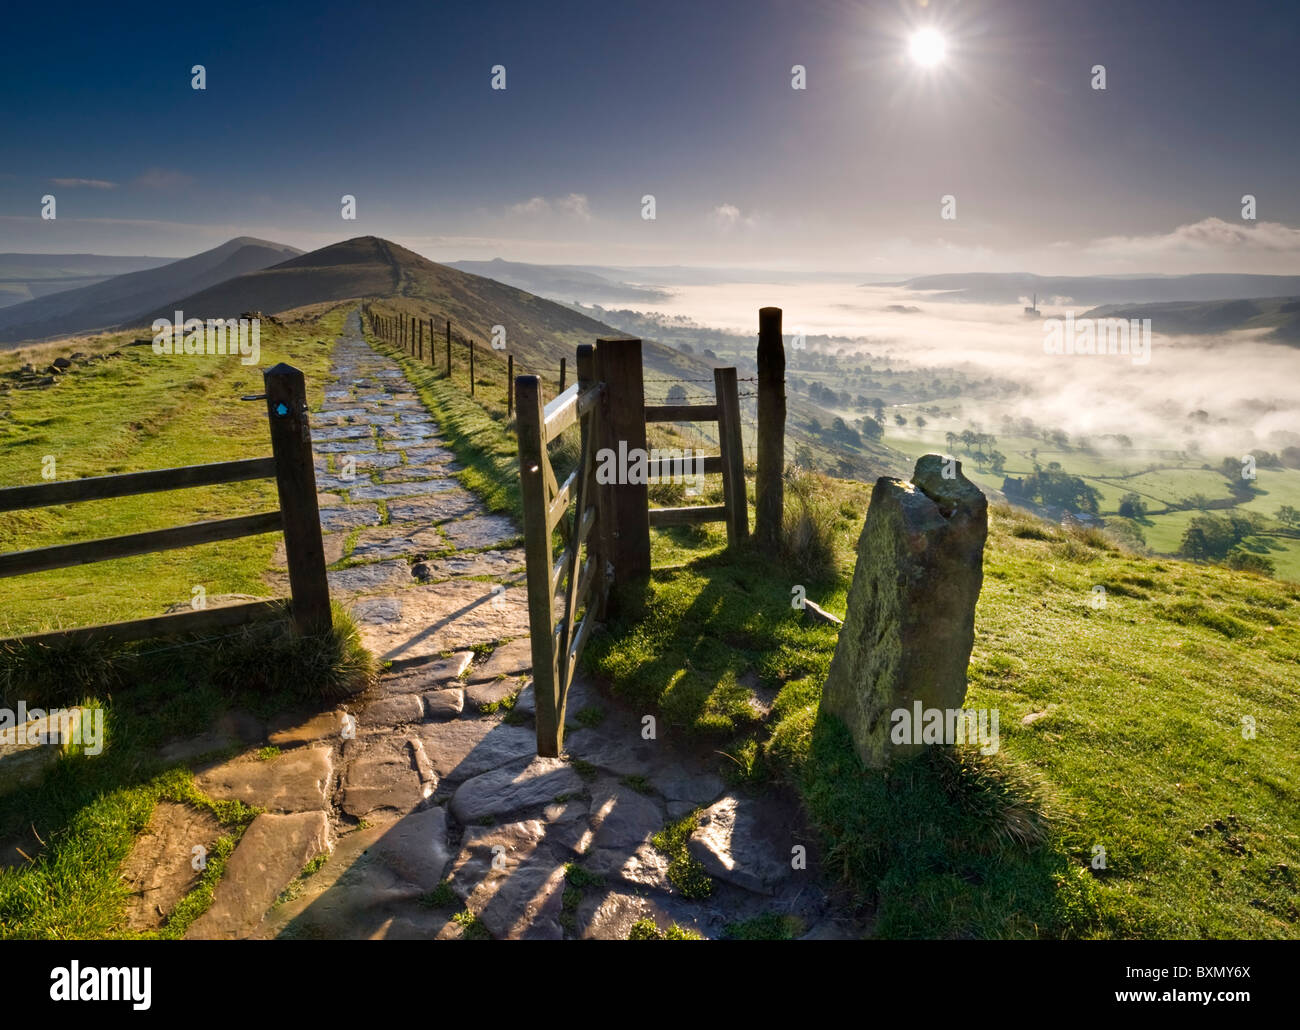 Nebel beladen Hope Valley unterhalb der großen Ridge, Peak District National Park, Derbyshire, England, UK Stockbild